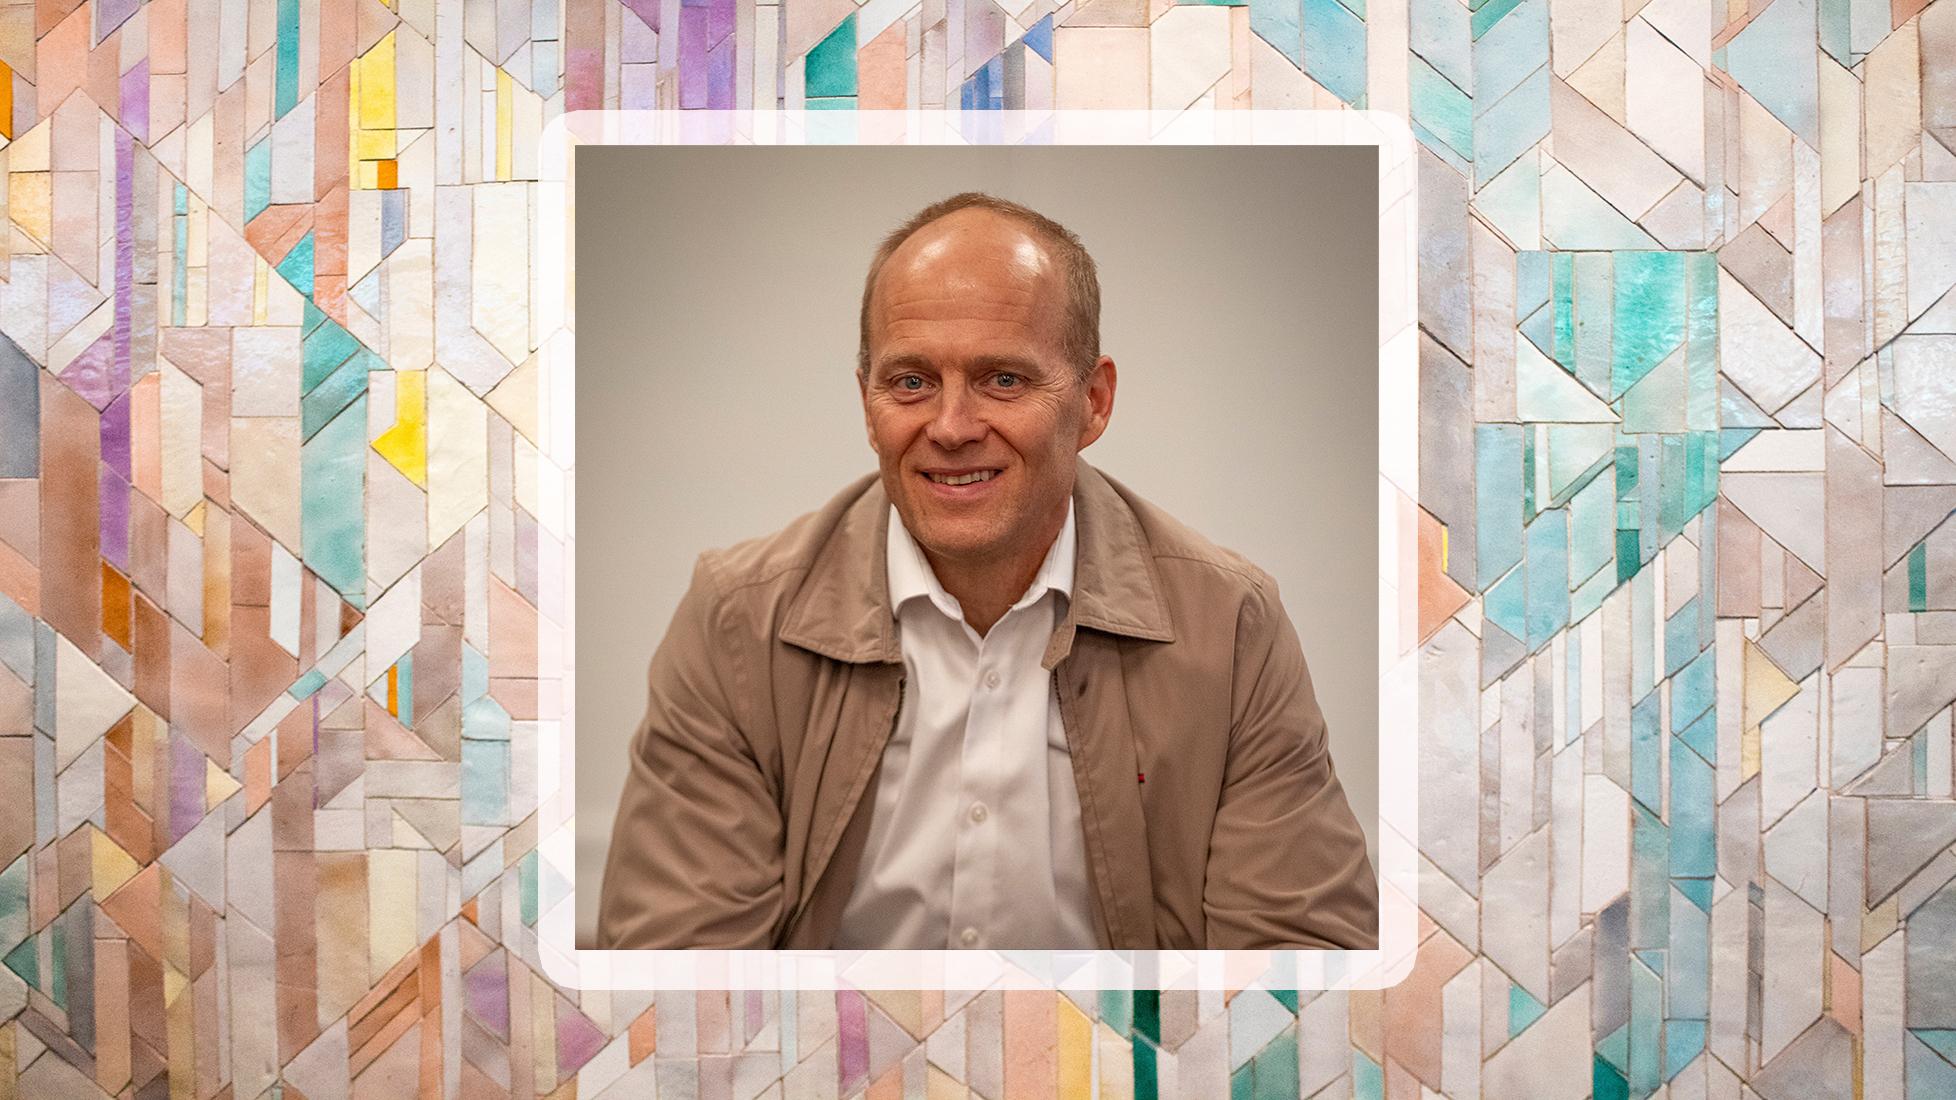 Podcast image of Bert Sarkkinen